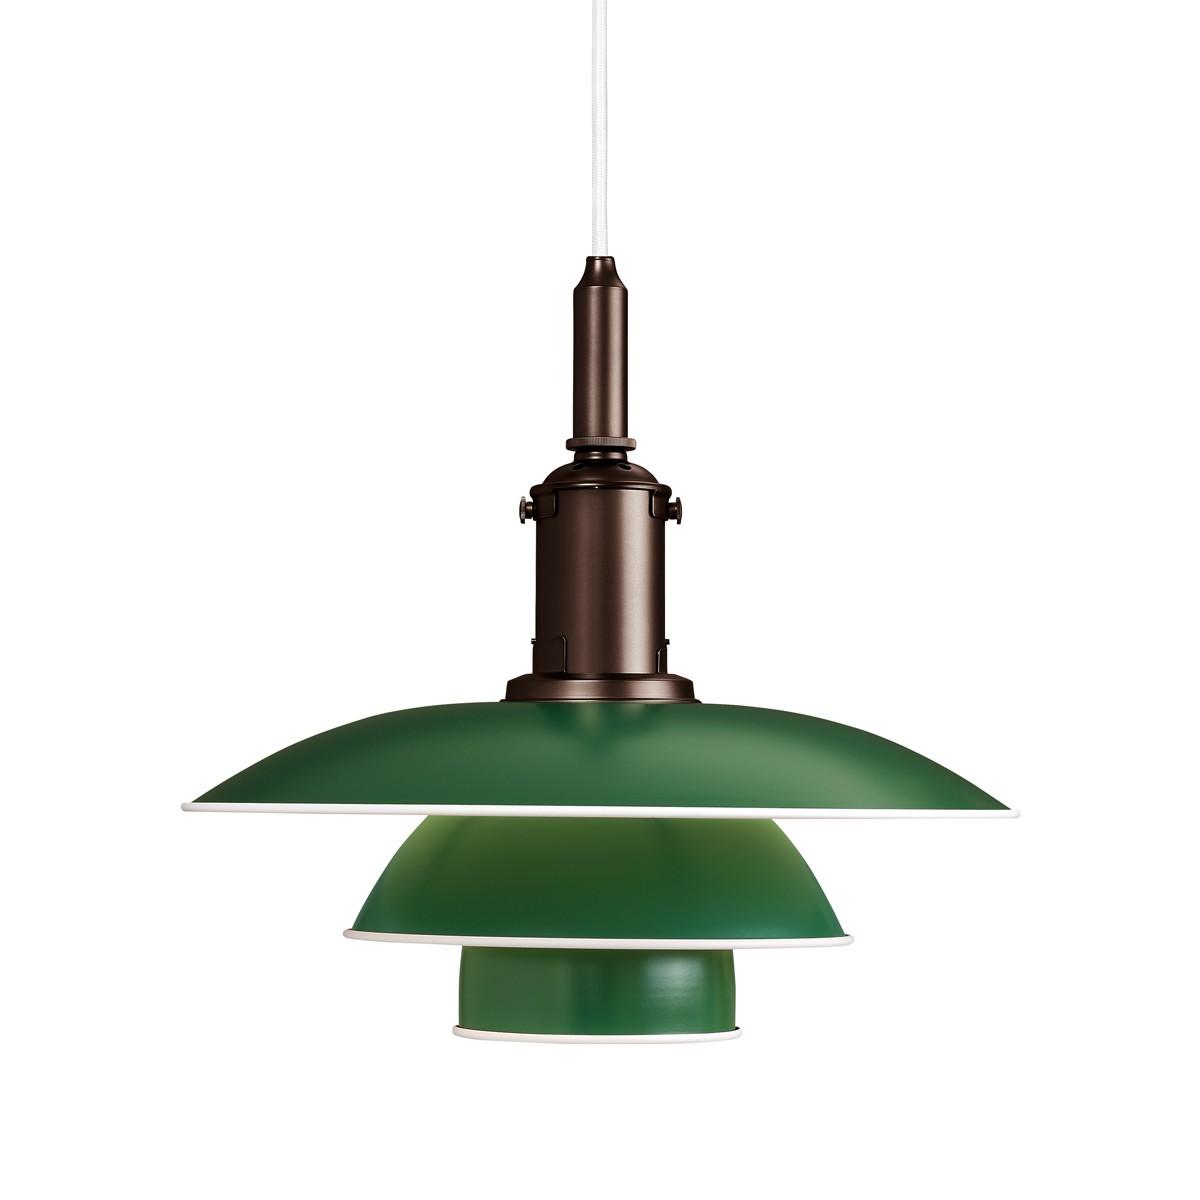 Louis Poulsen PH 3½-3 Pendelleuchte, grün